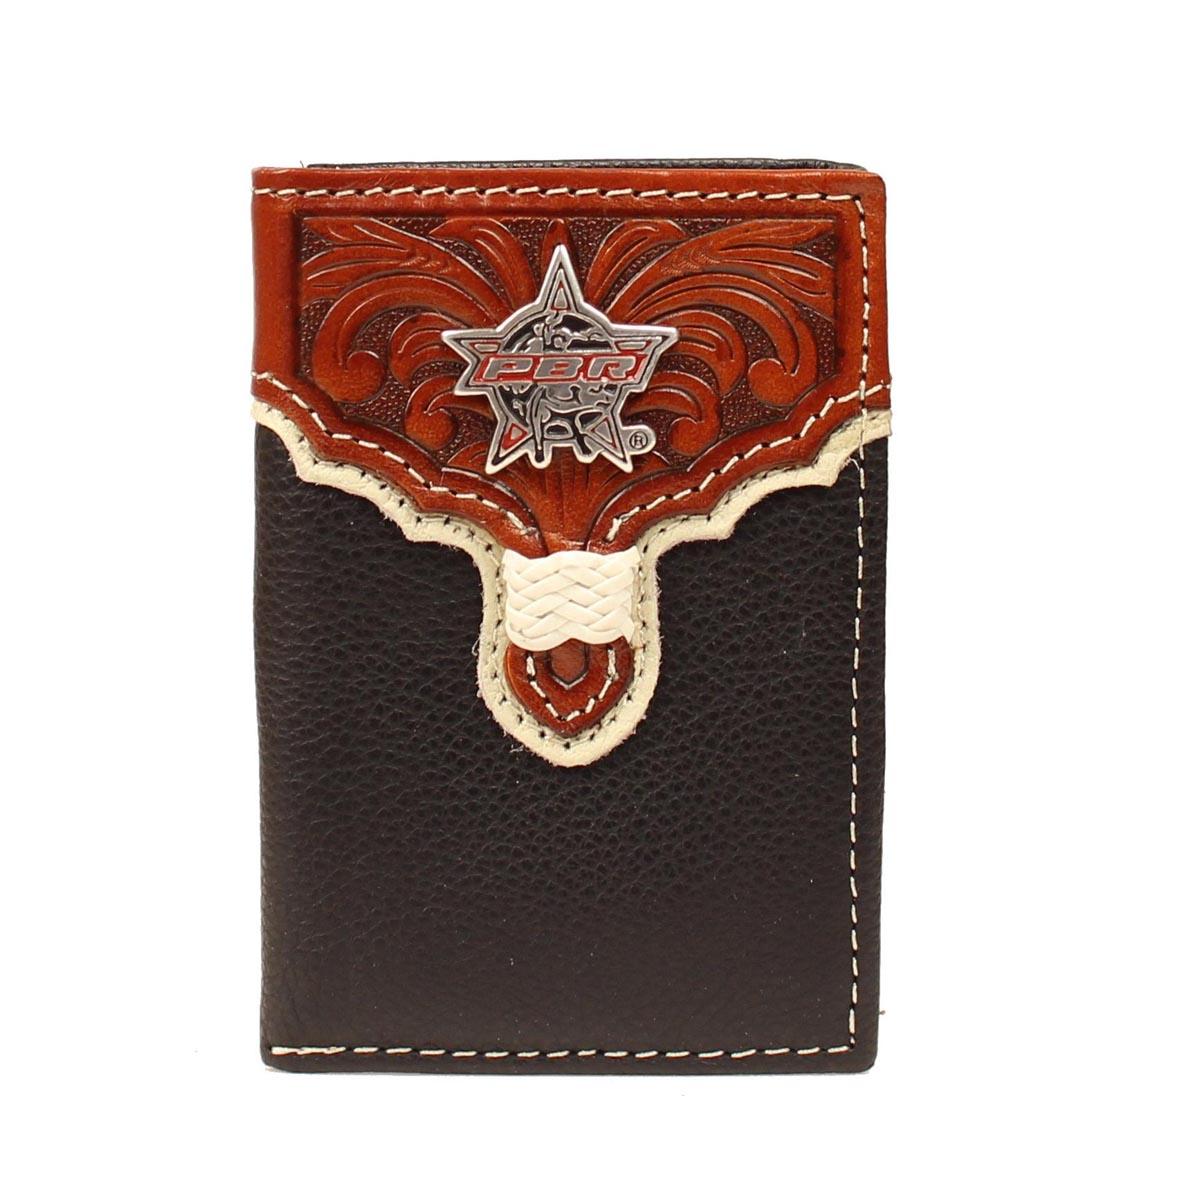 PBR Tri-fold Tooled Overlay Star Wallet